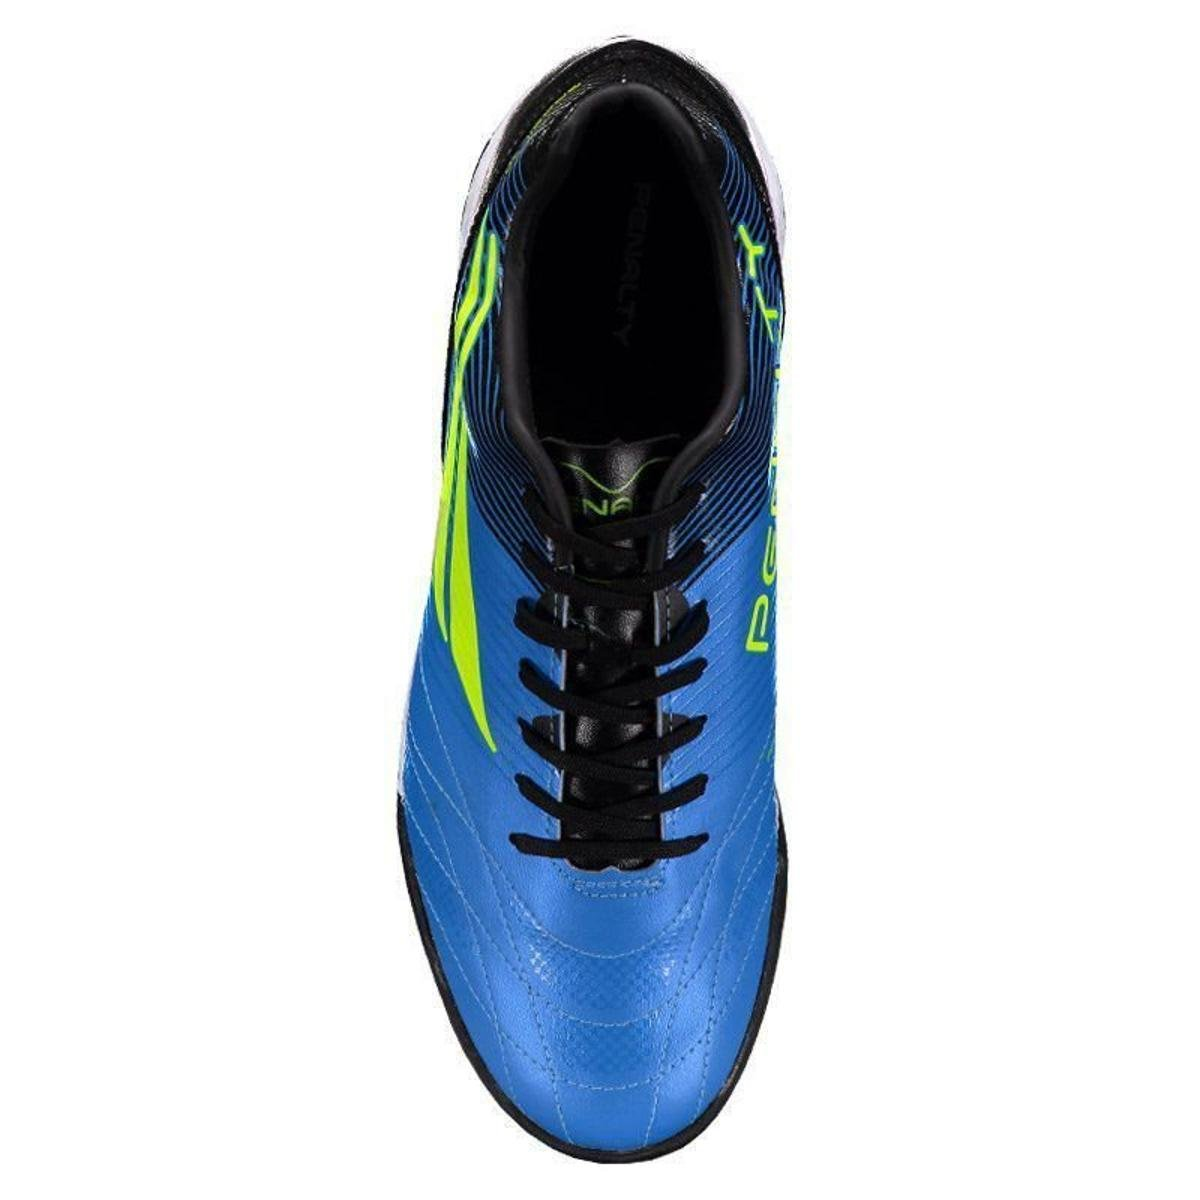 Chuteira Penalty Brasil 70 R2 VIII Society Masculina - Azul - Compre ... 7816877d39f8b